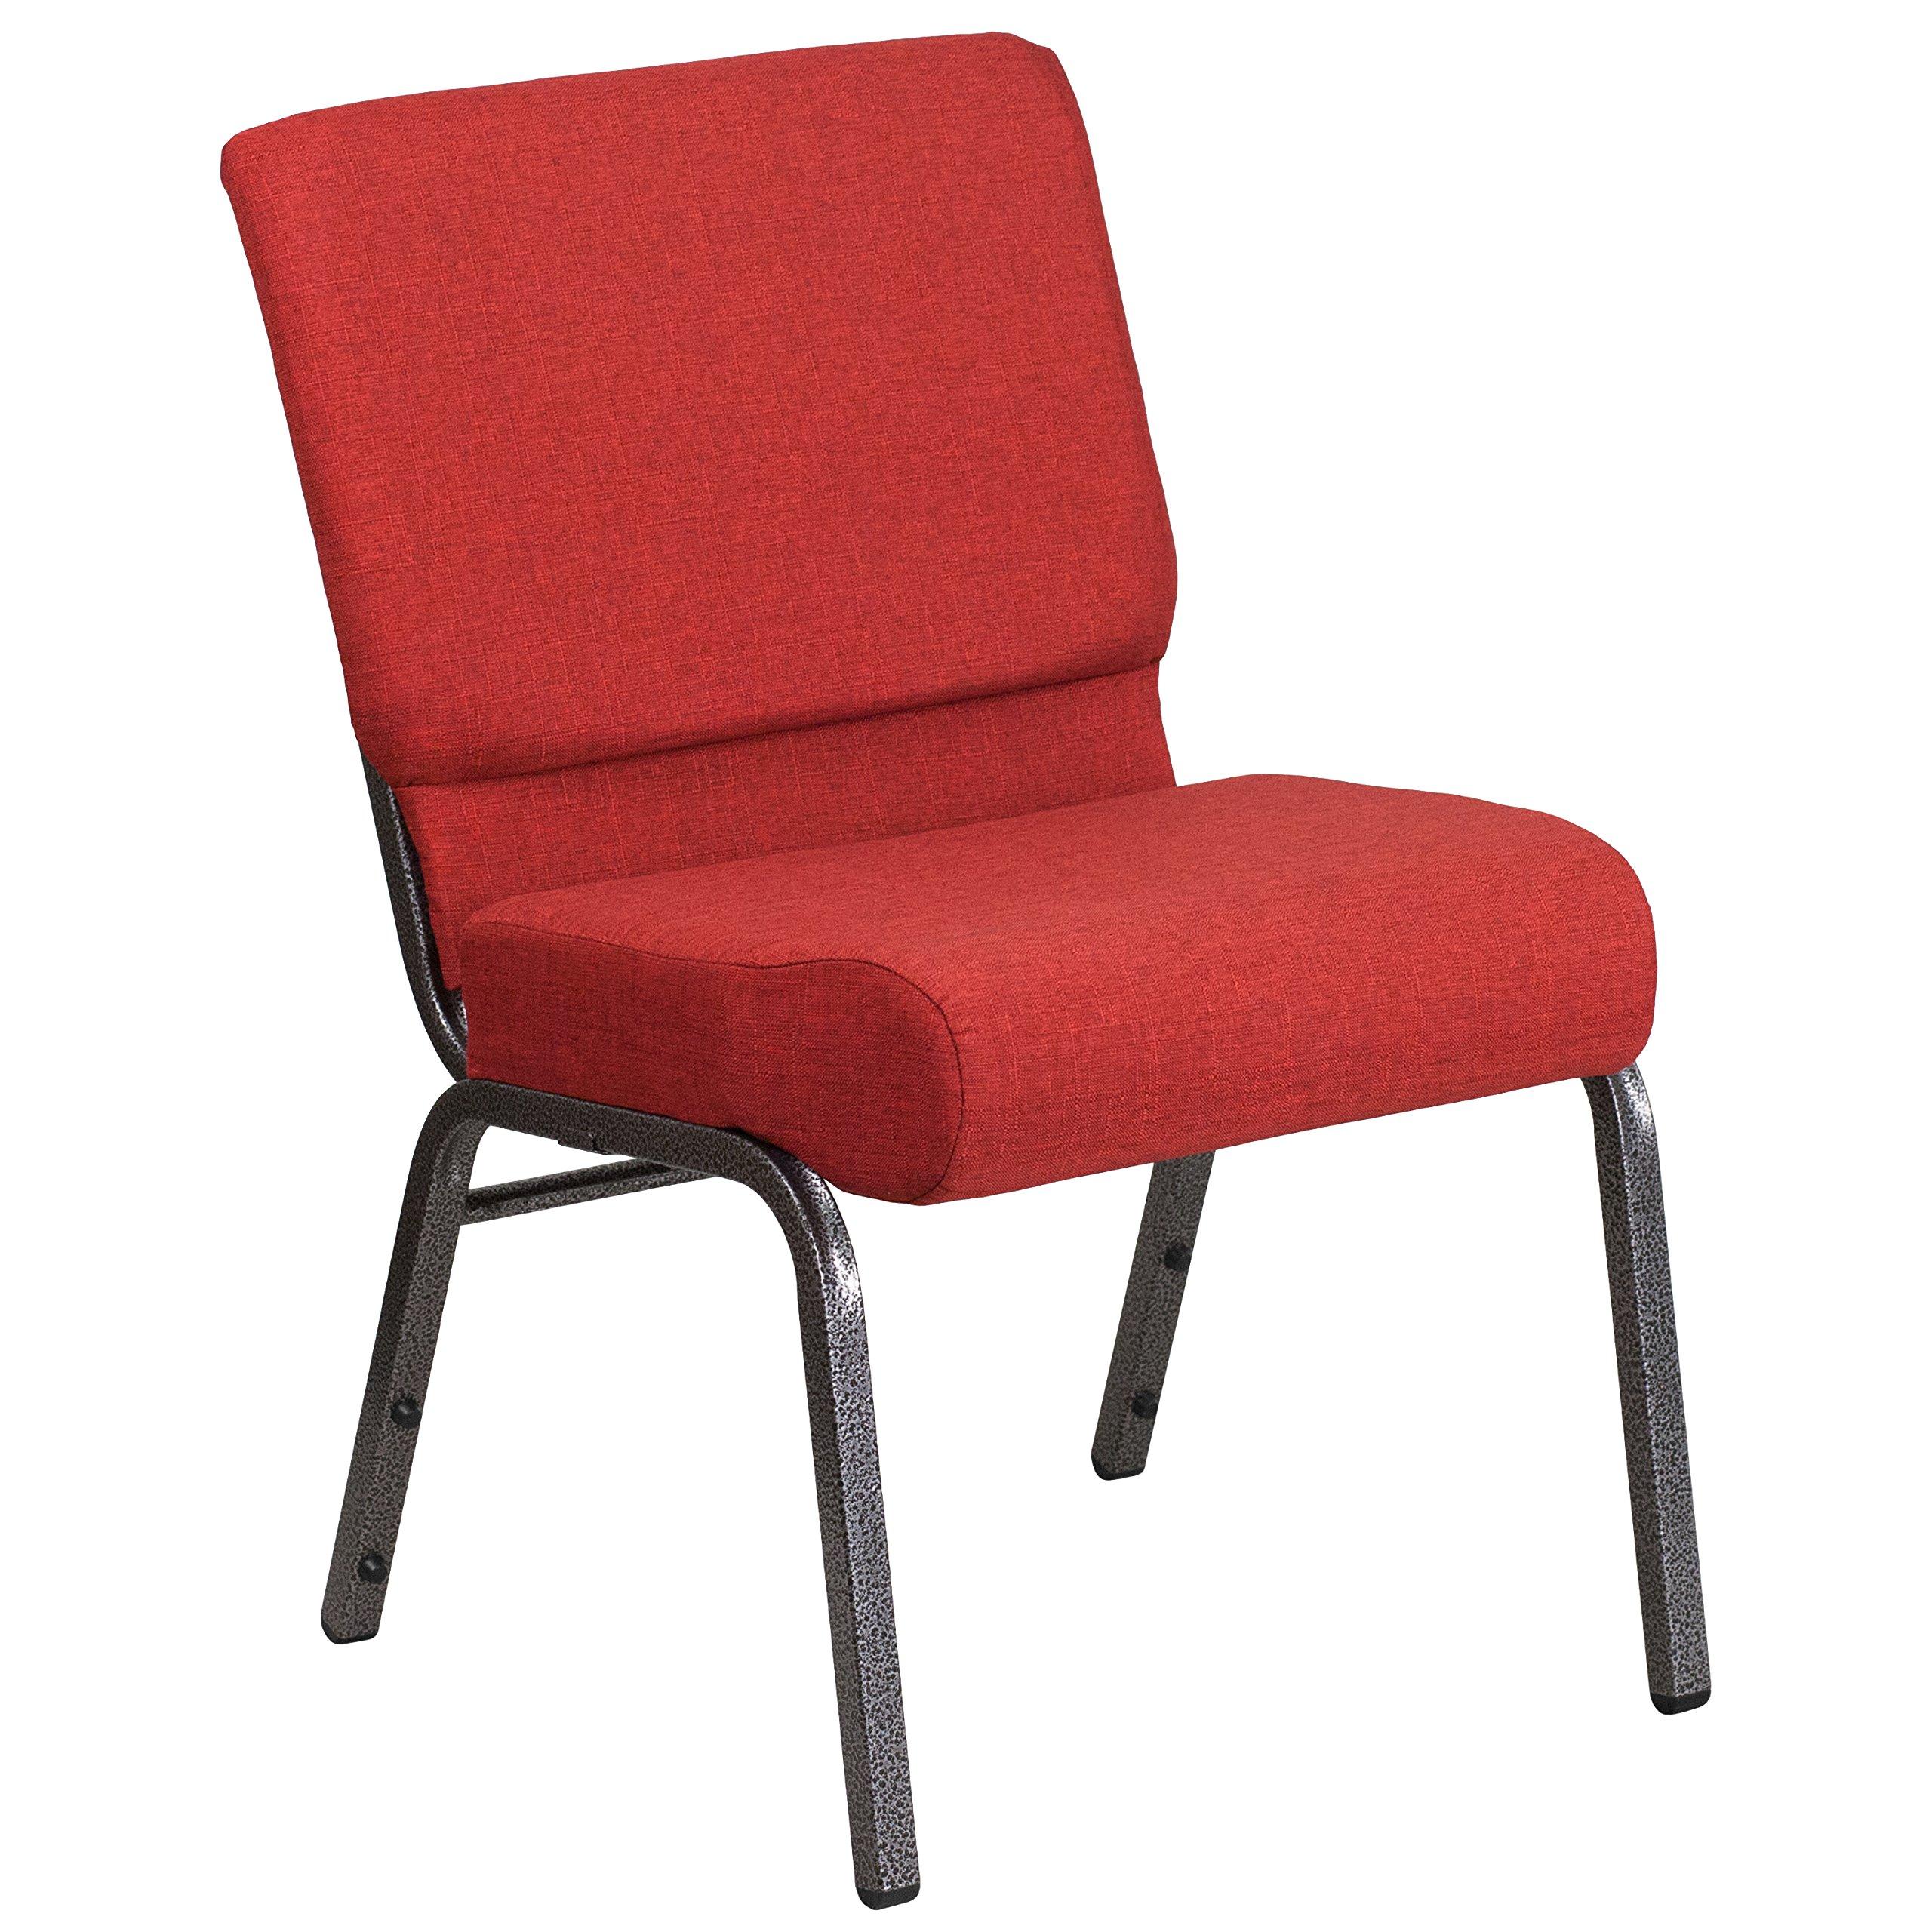 Flash Furniture HERCULES Series 21''W Stacking Church Chair in Crimson Fabric - Silver Vein Frame by Flash Furniture